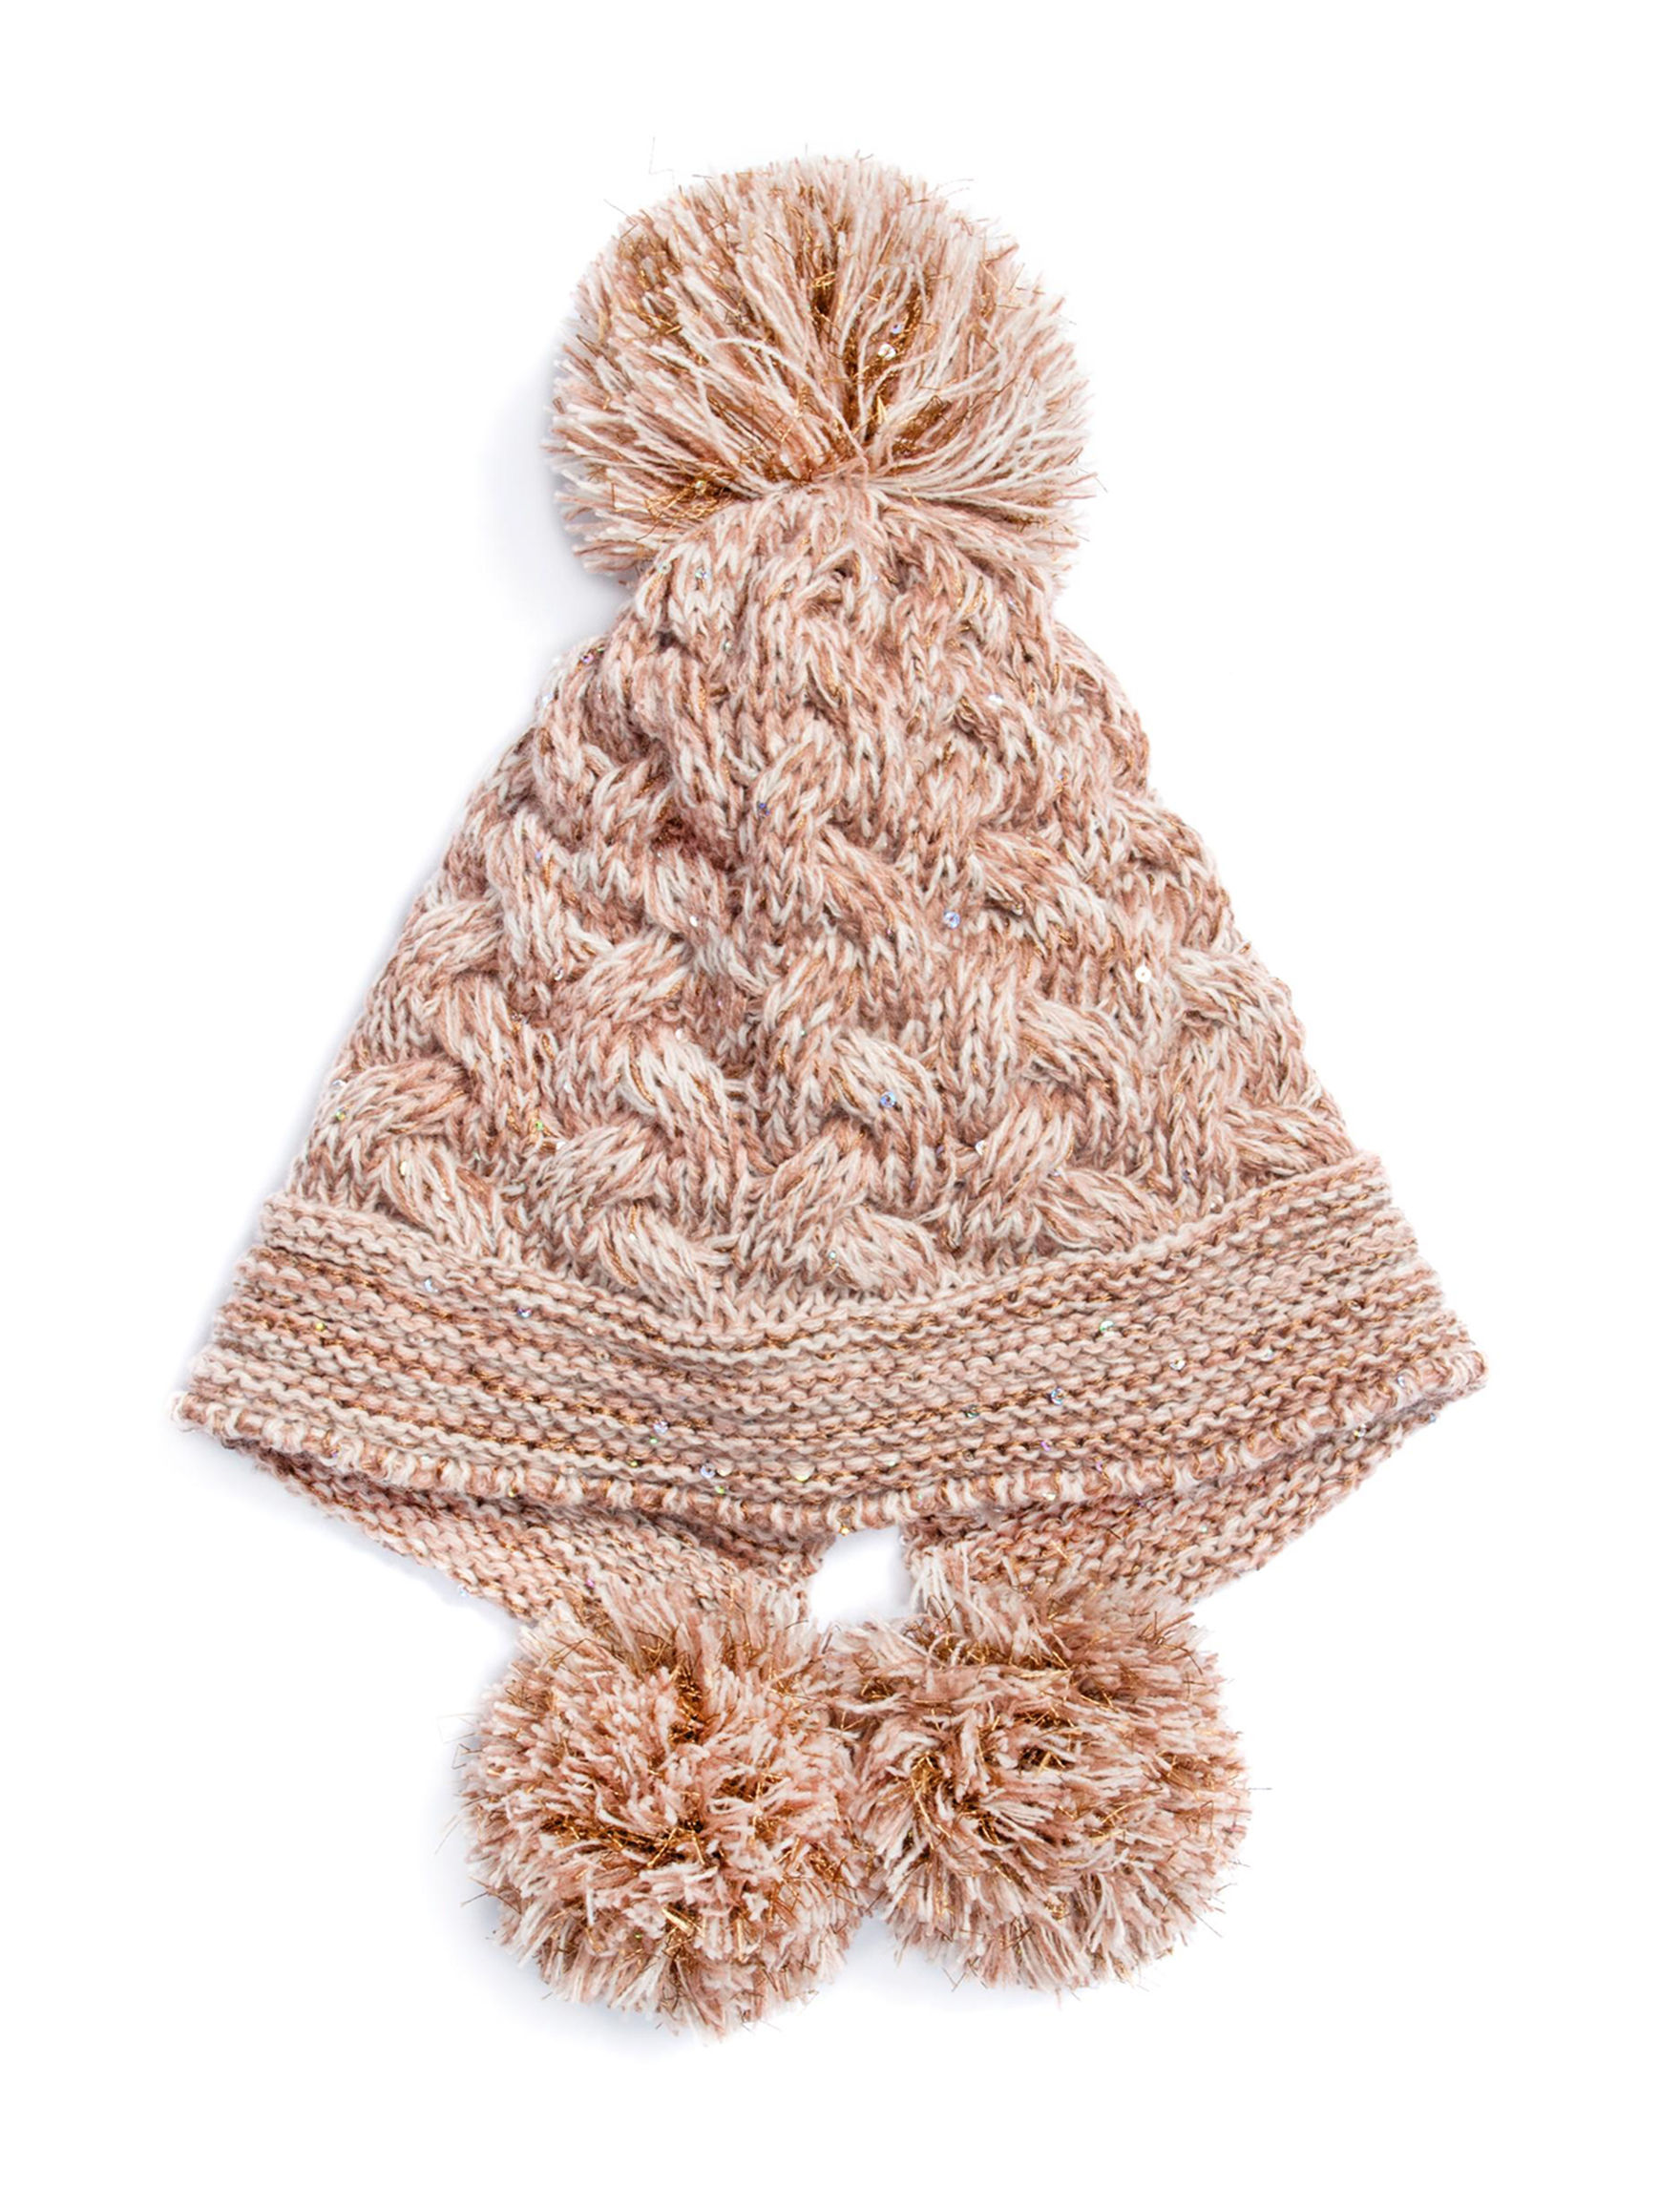 Muk Luks Blush Hats & Headwear